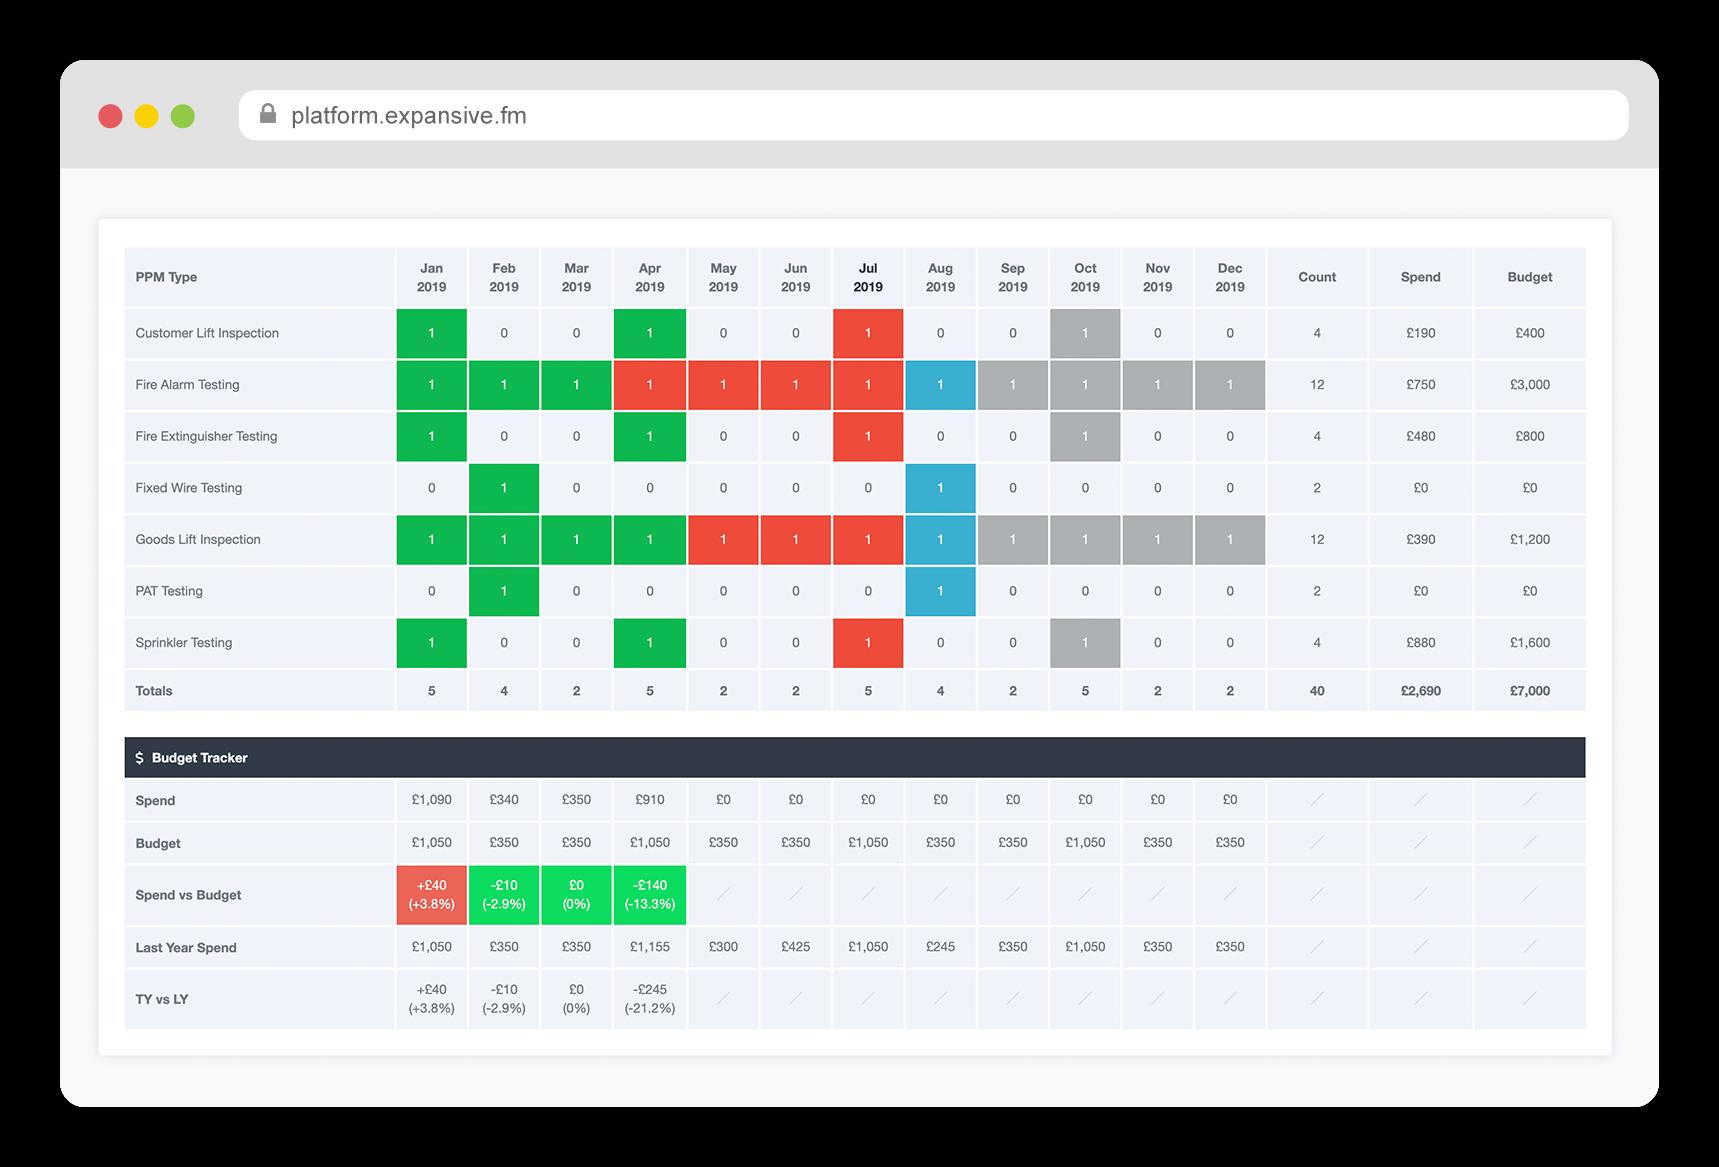 Expansive screenshot: Expansive planned preventive maintenance